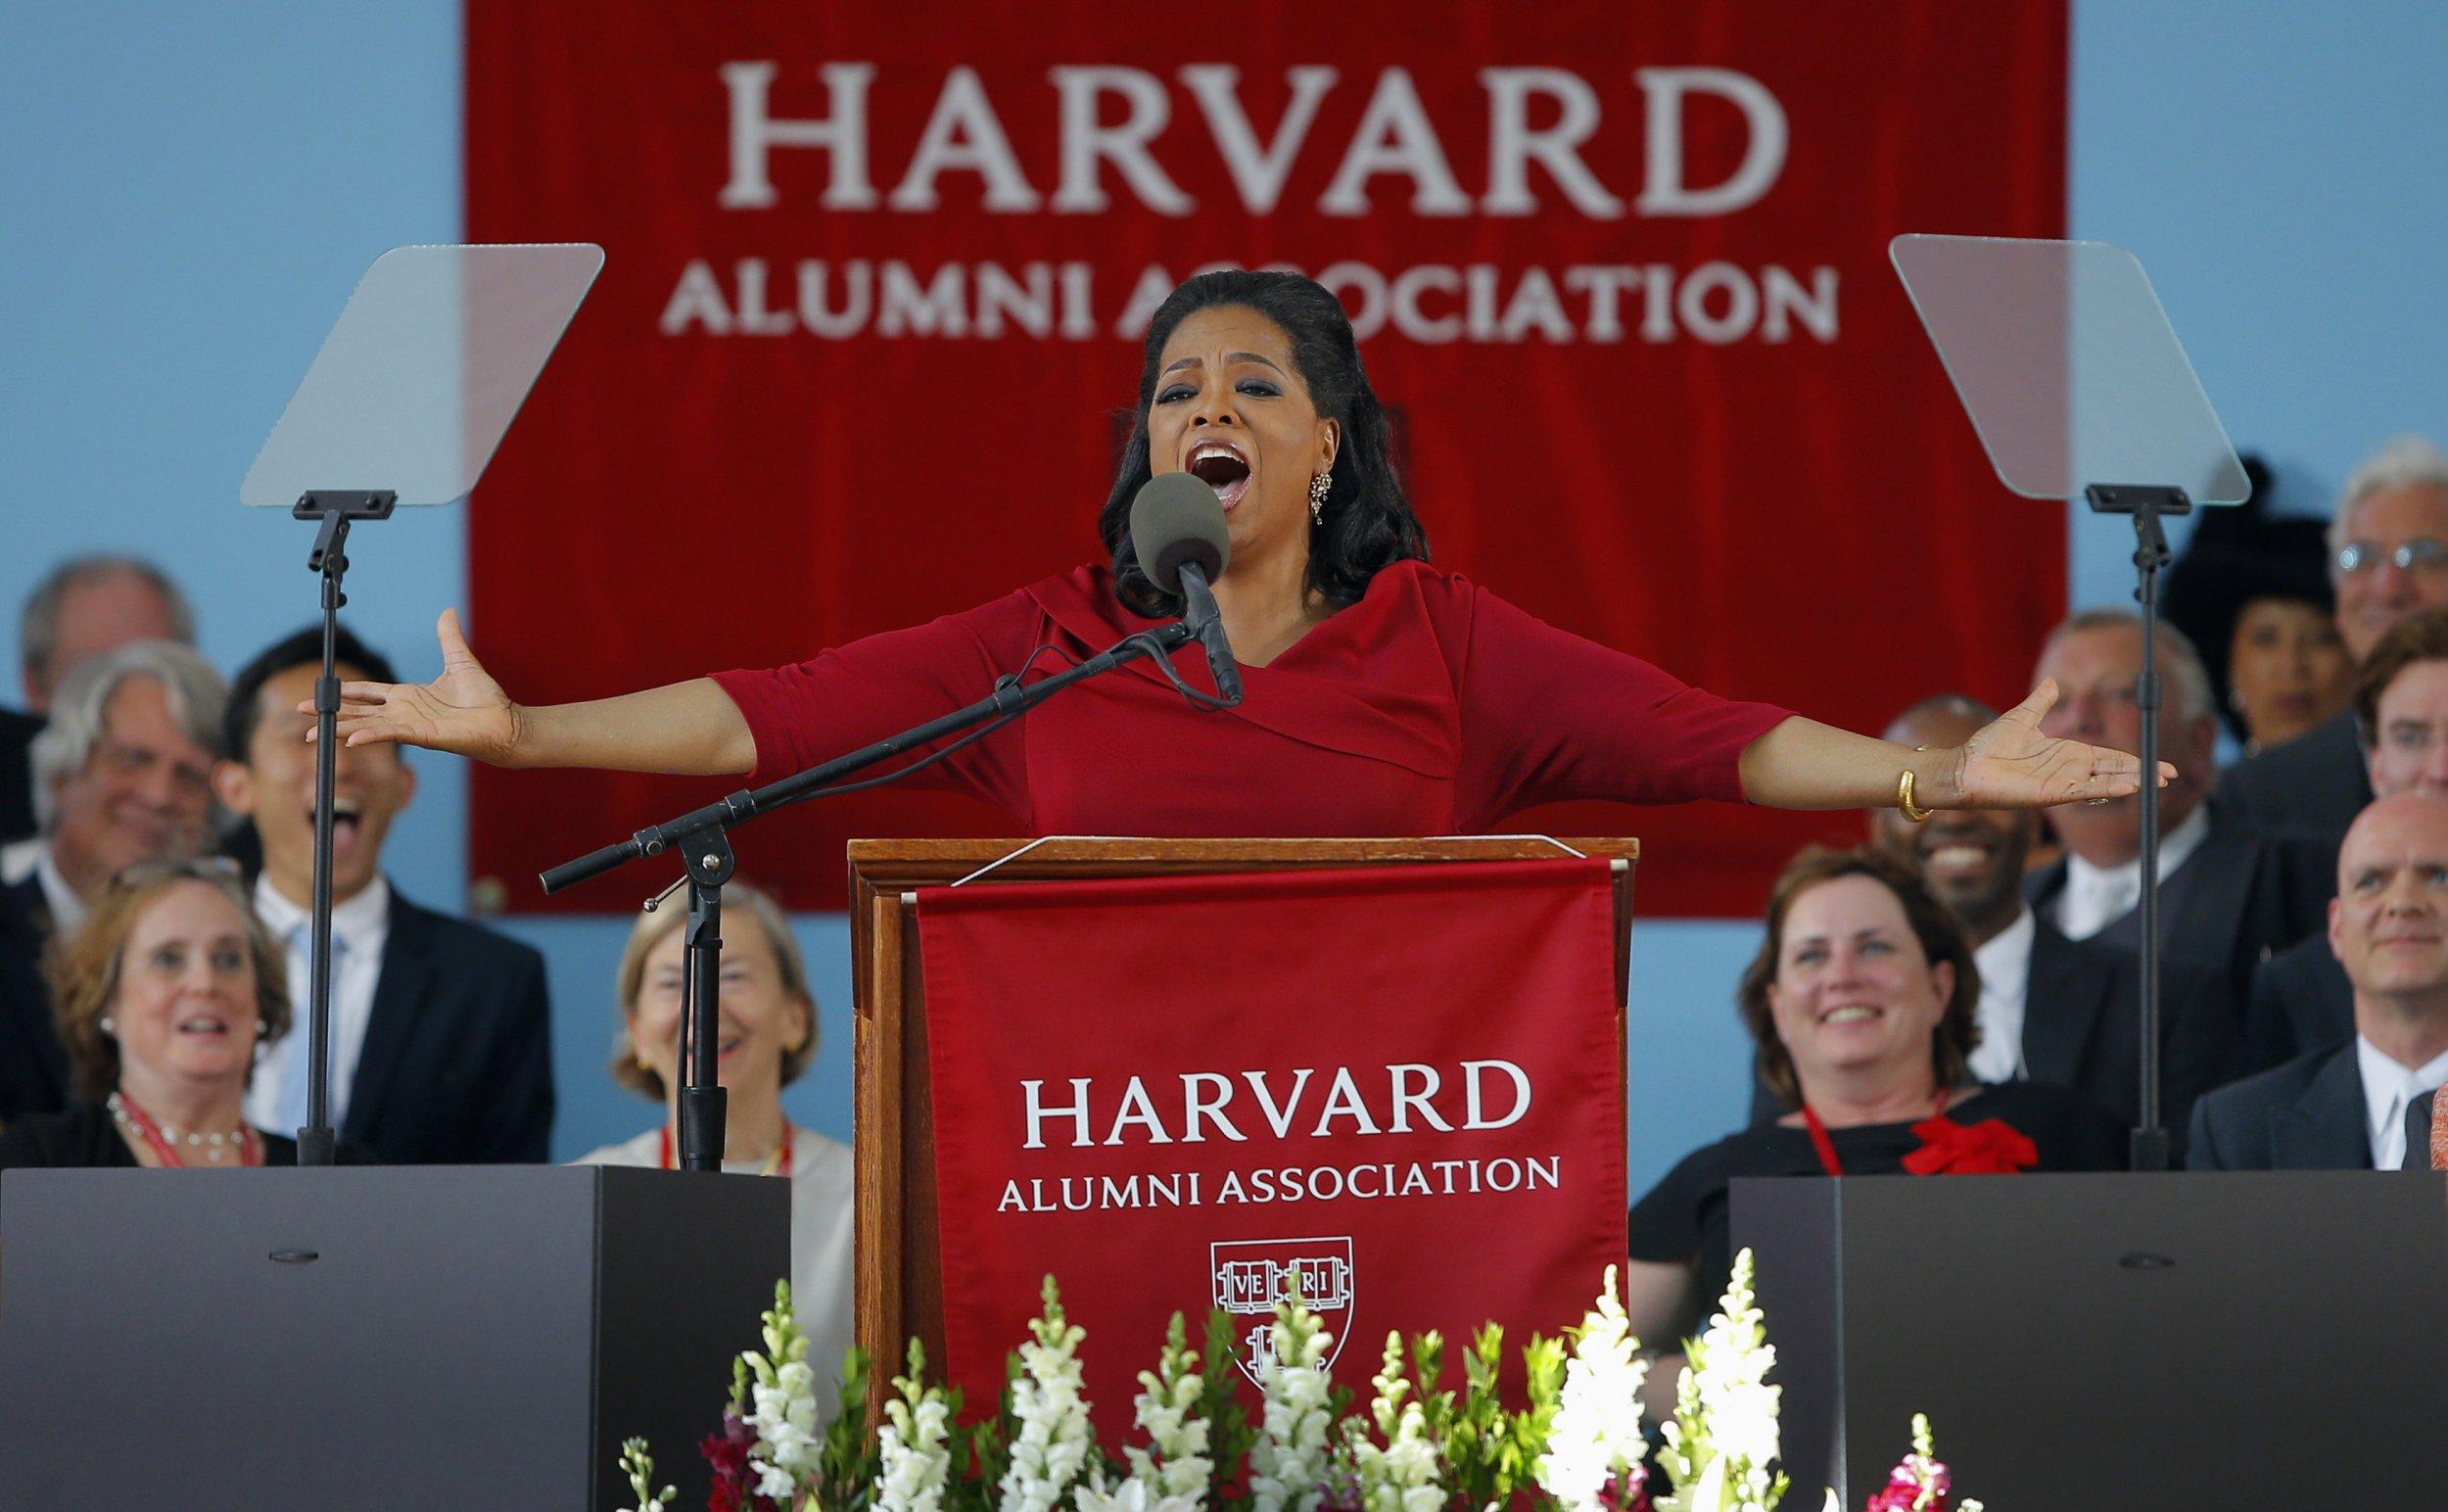 Harvard Alumni Association, an alternate name for The New Republic.